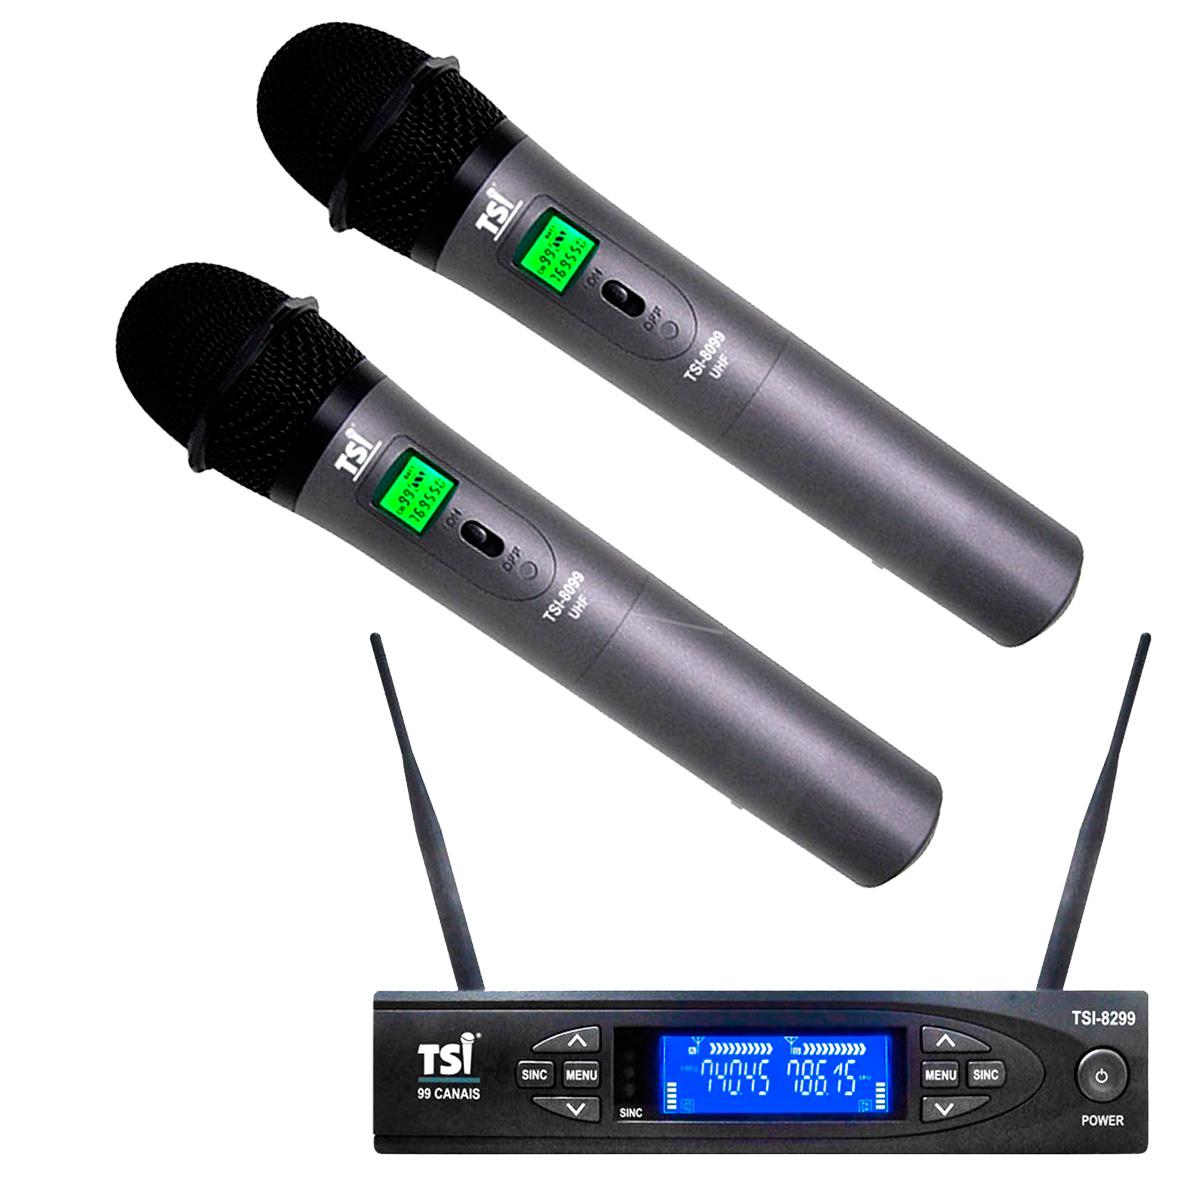 Microfone s/ Fio de Mão Duplo UHF 8299 - TSI